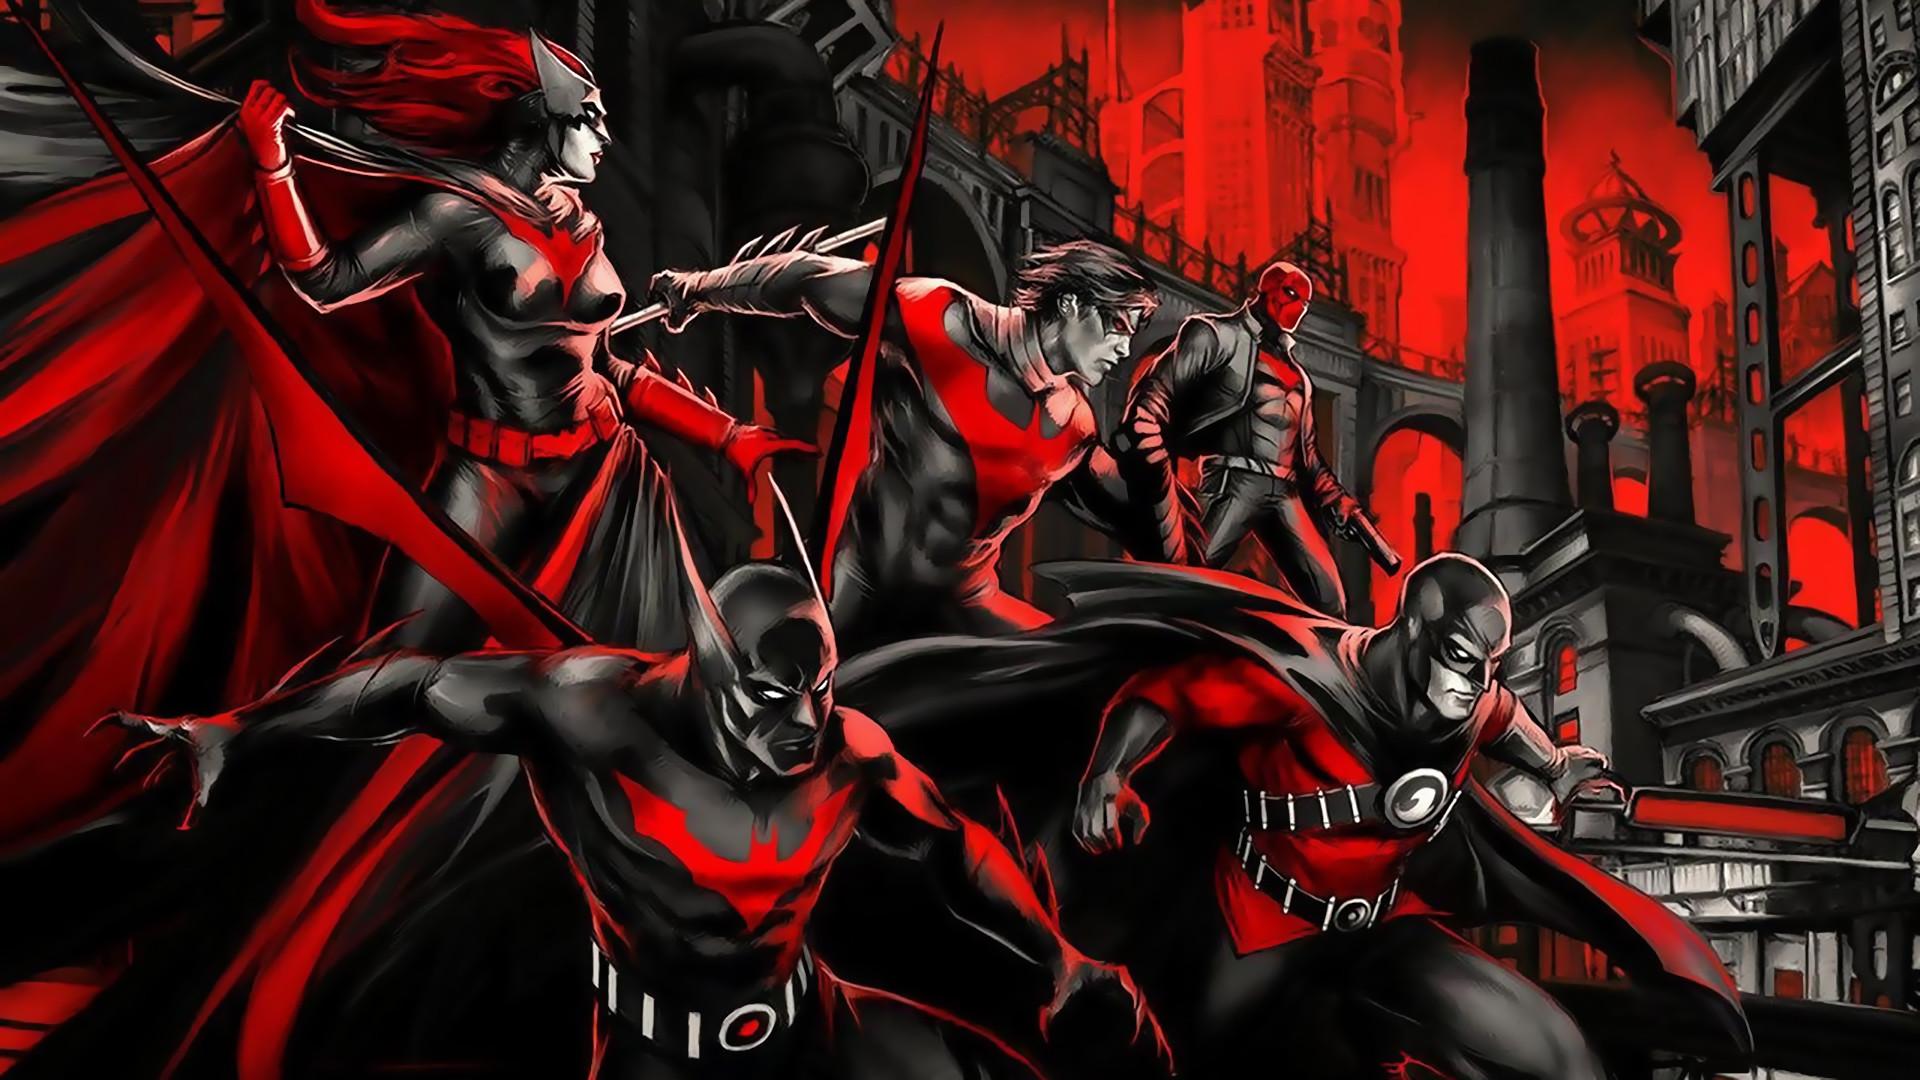 Nightwing Wallpaper Hd Hd wallpaper